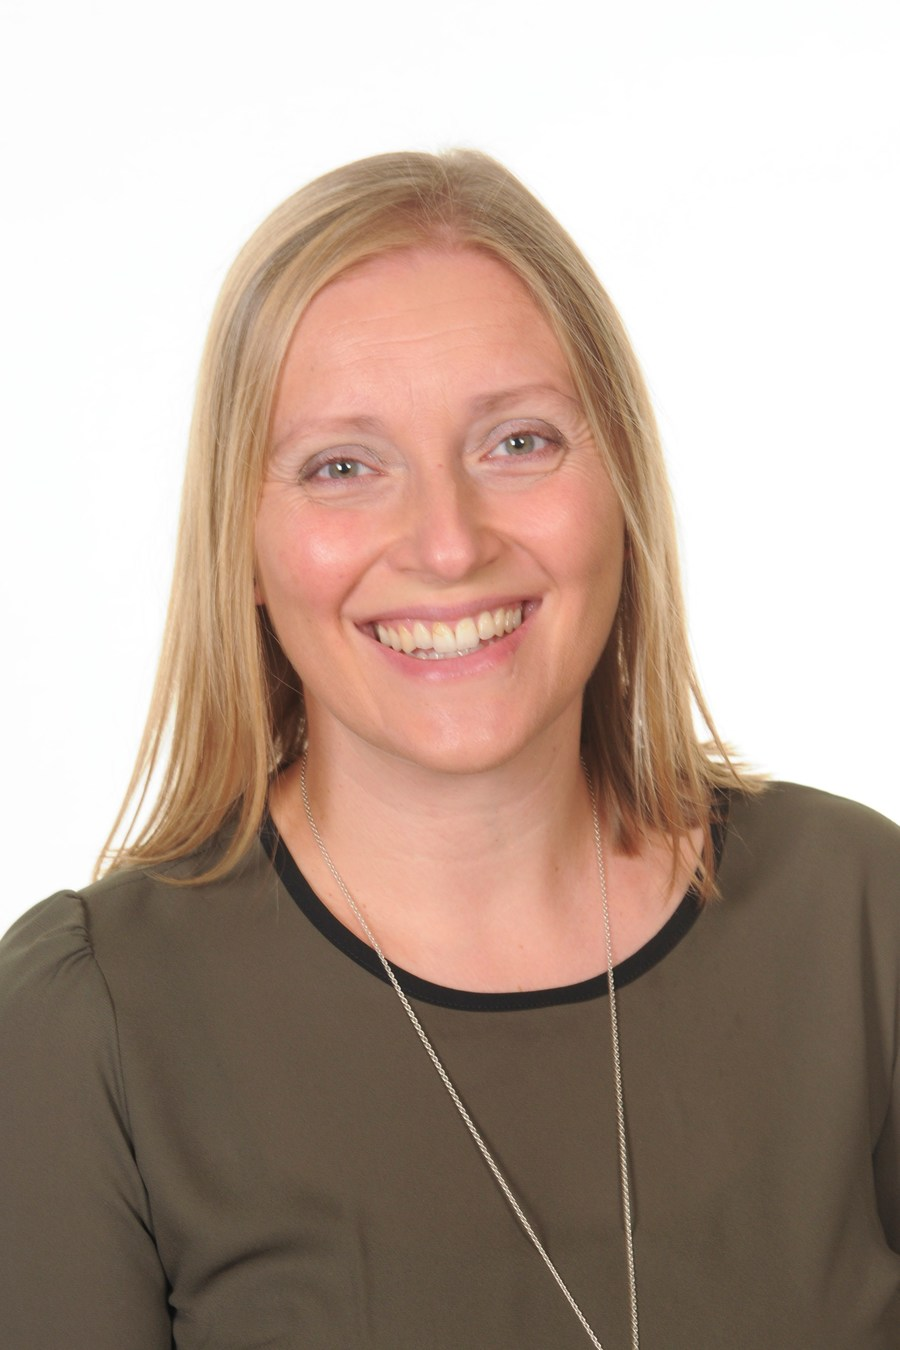 Wendy Thomas BA (Hons) Prim Ed (QTS) MA Prof Studies in Ed, SEN; Senior Teacher/SENCo